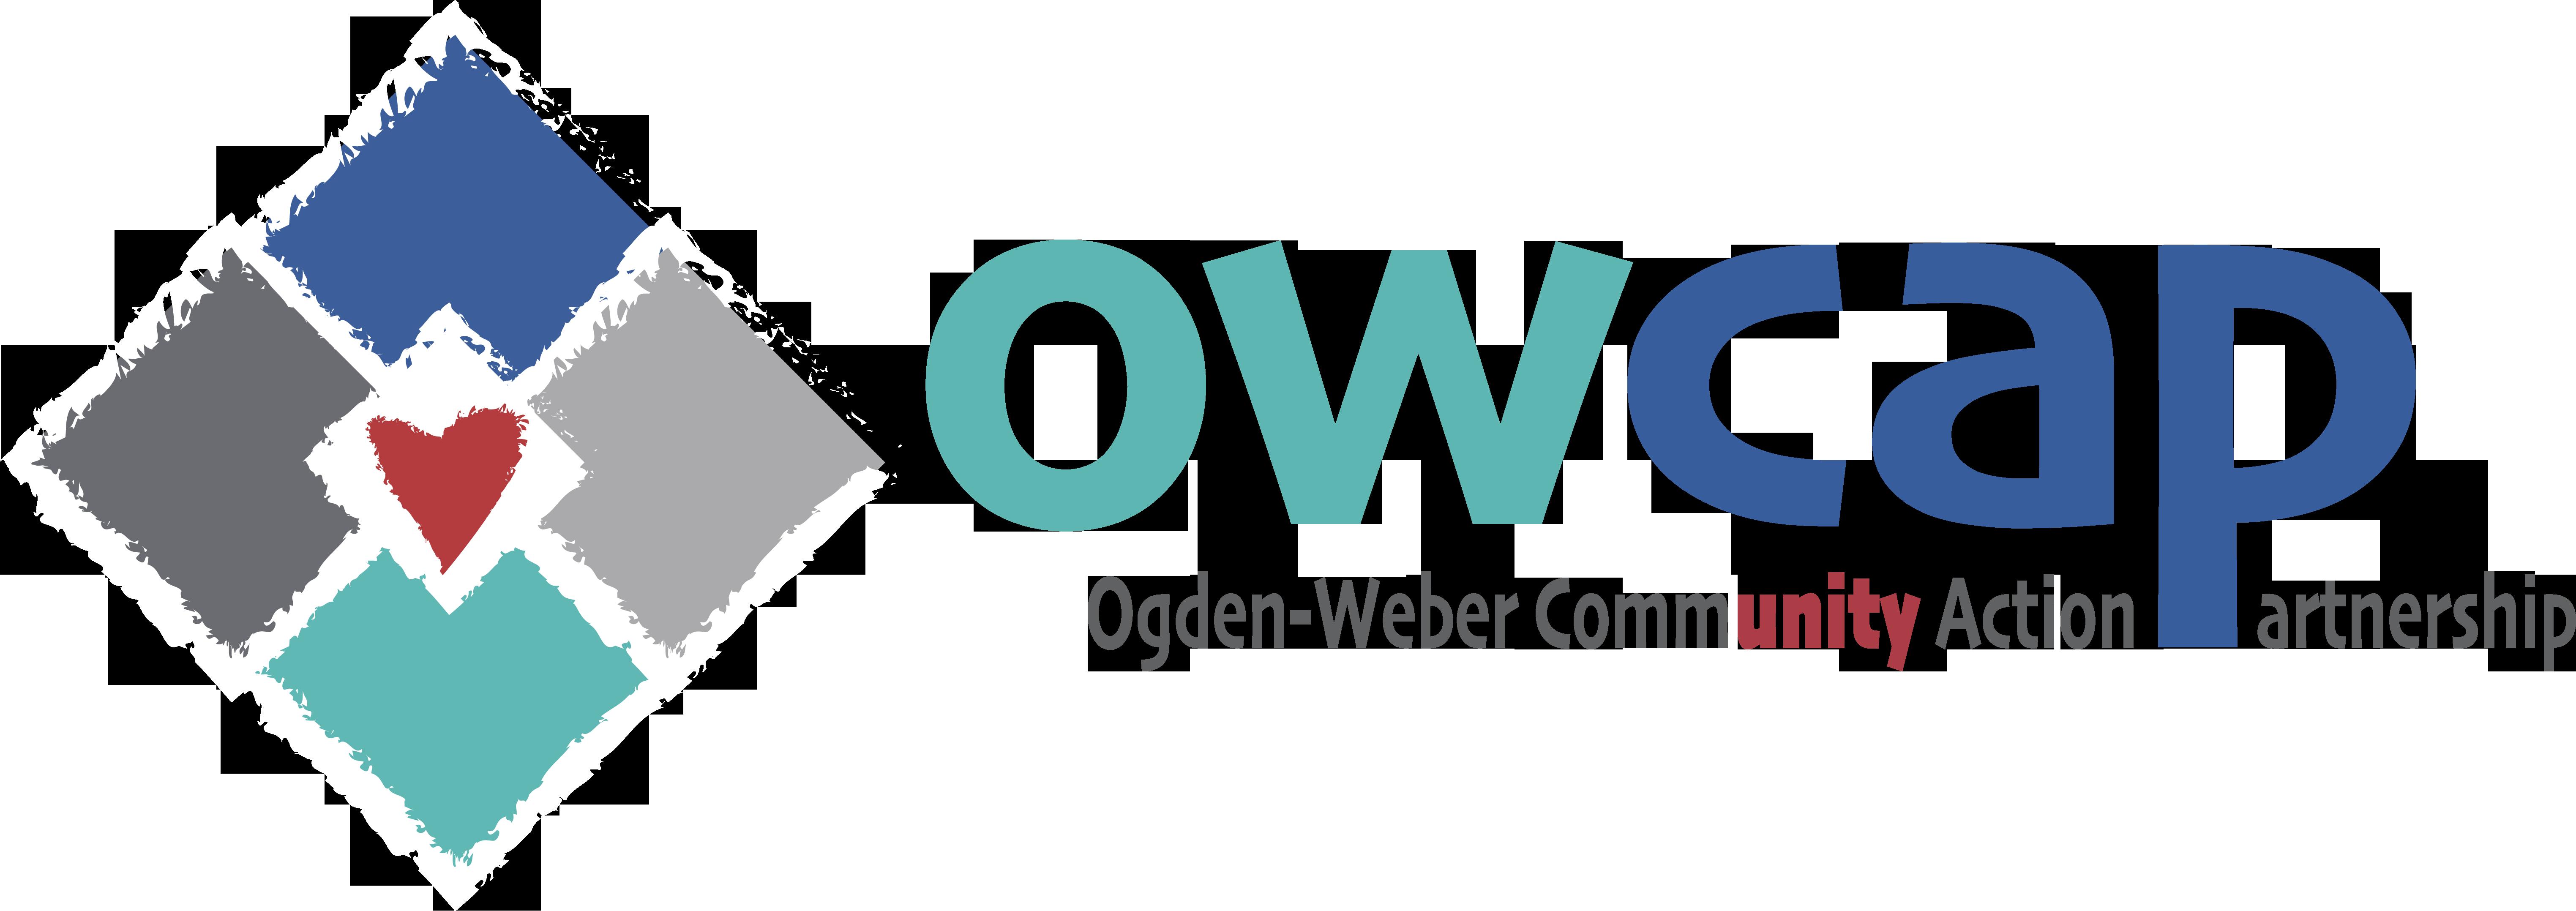 OWCAP's Logo